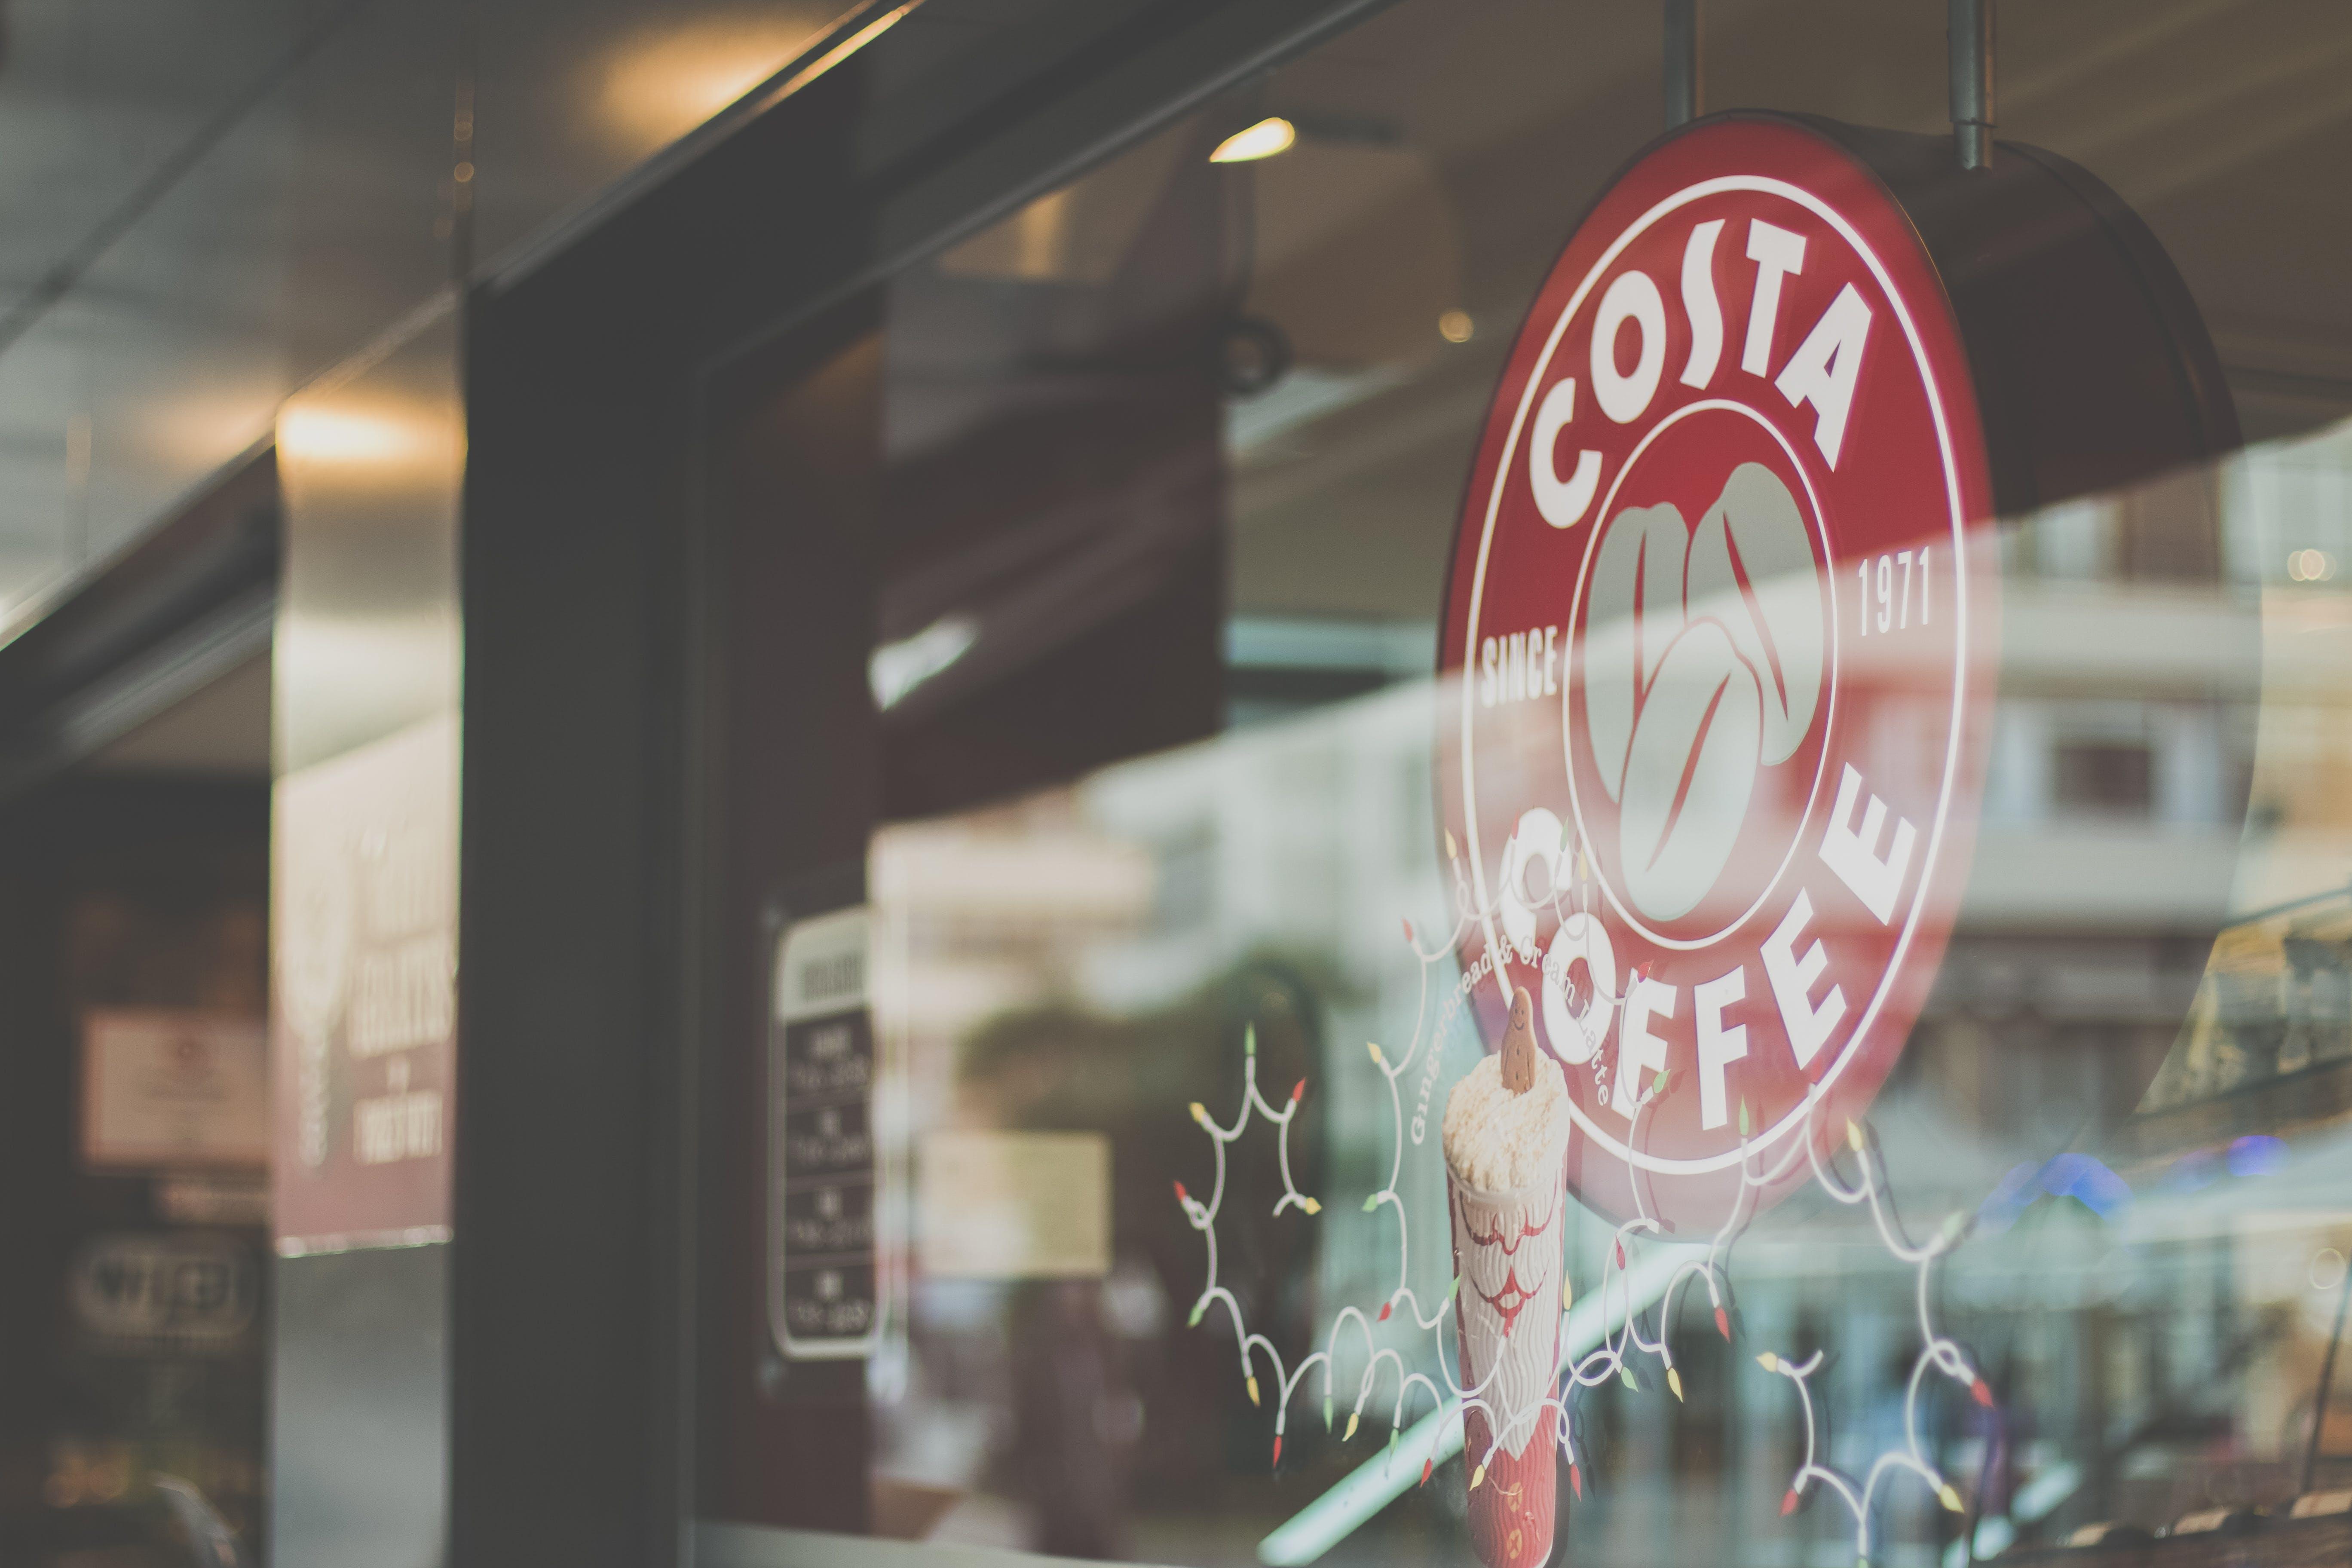 Costa Coffee Store